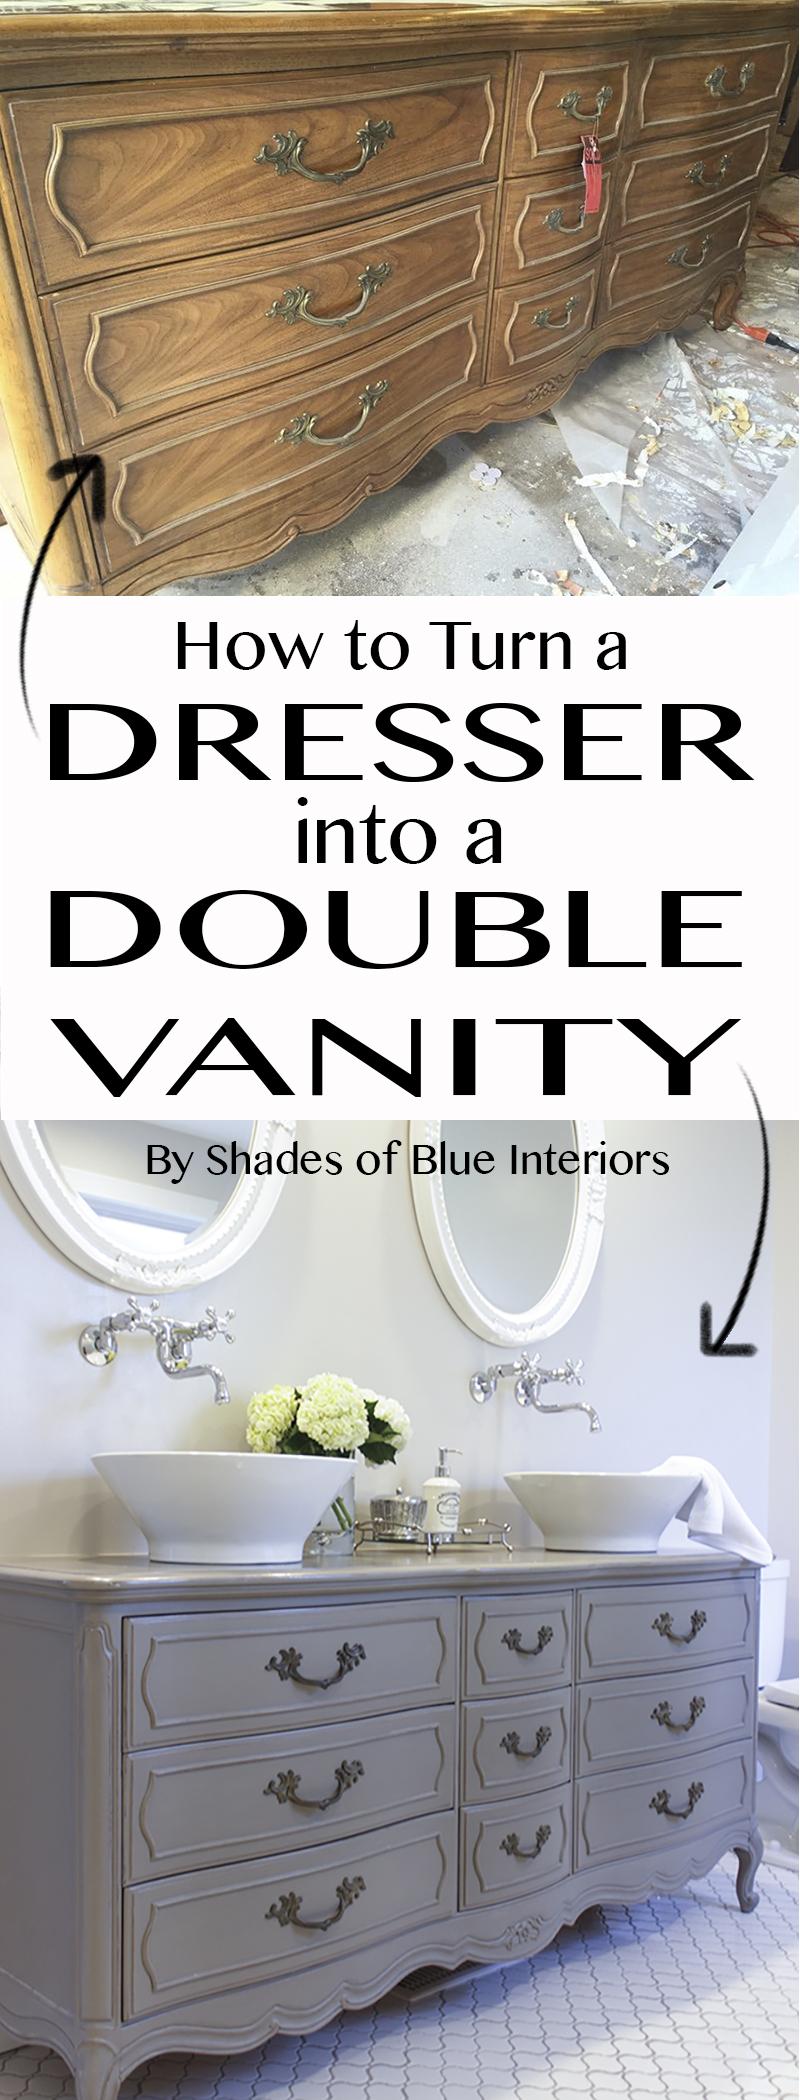 Stunning Bathroom Tour Dresser Into Double Vanity